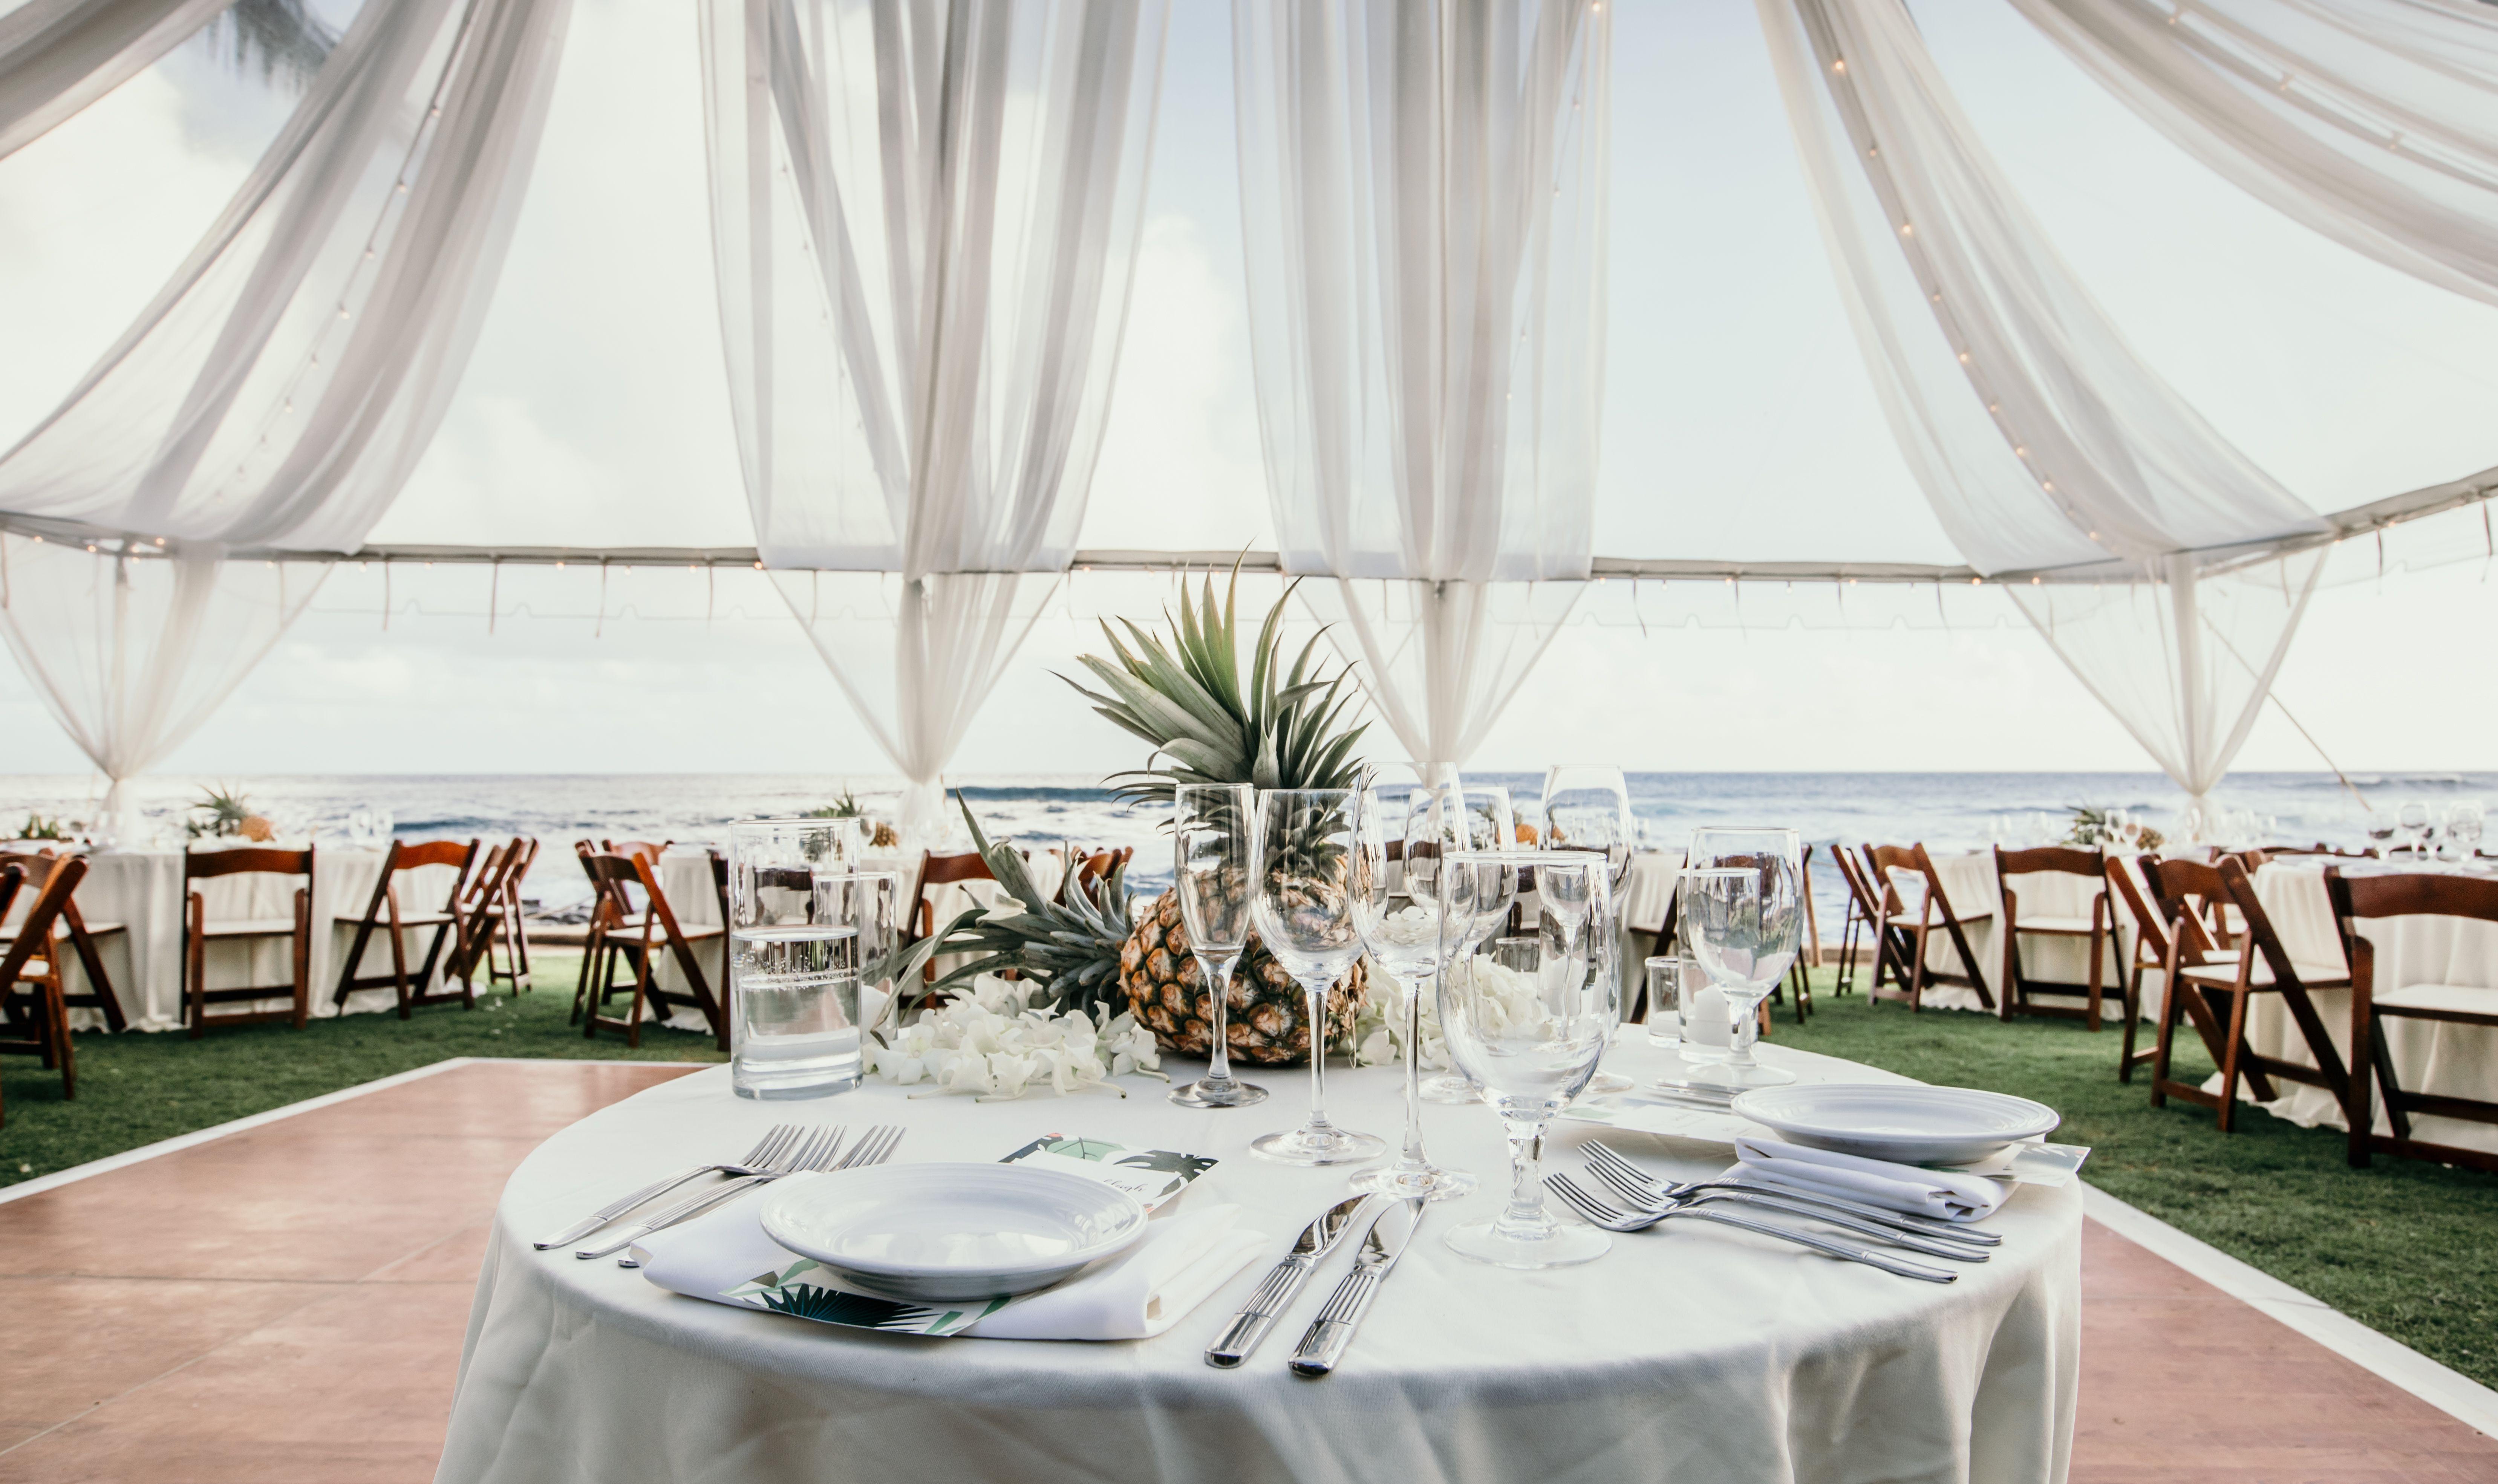 Oceanfront Wedding Reception The Beach House Kauai Destination Hawaii Wedding Beach House Kauai Oceanfront Wedding Beach Wedding Reception